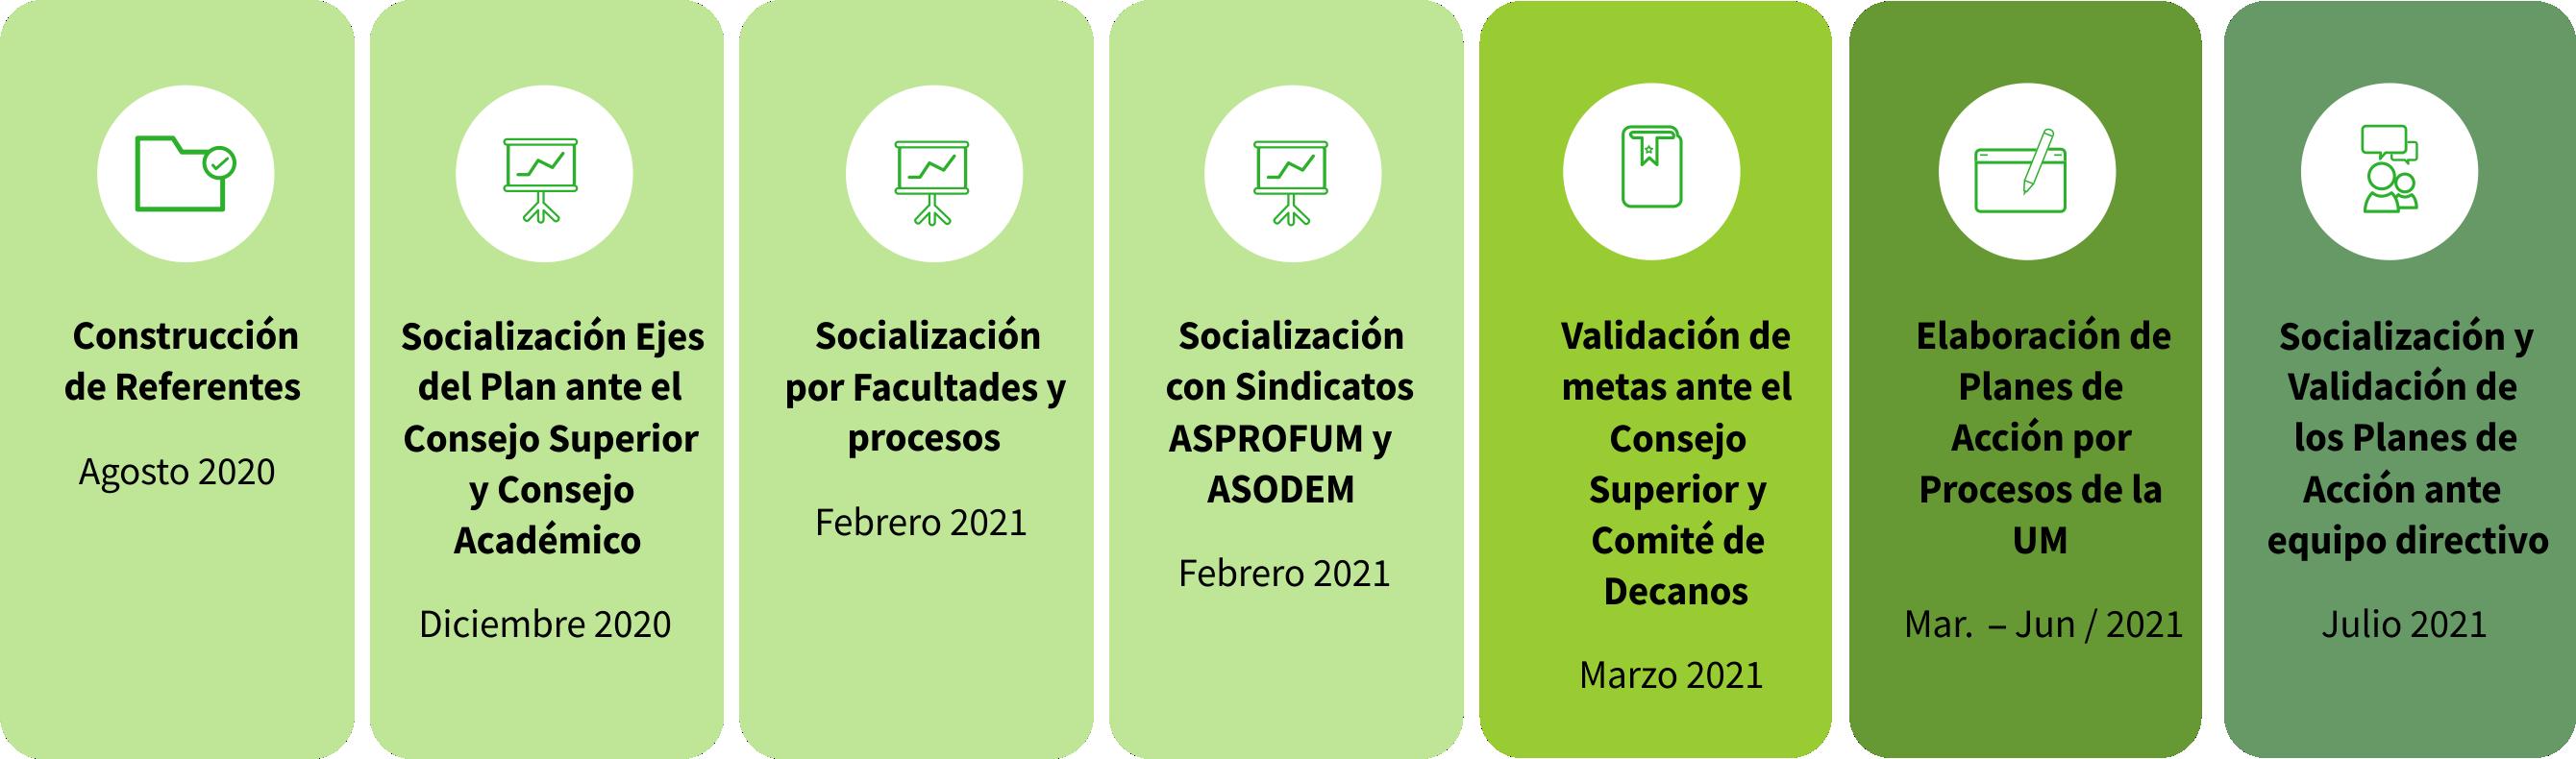 gestiondirectiva3